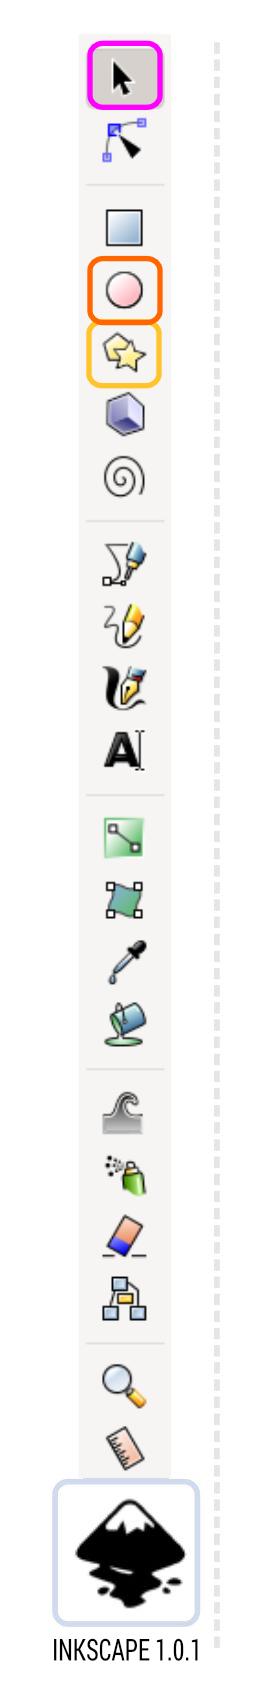 2Dgameartguru - inkscape toolbar